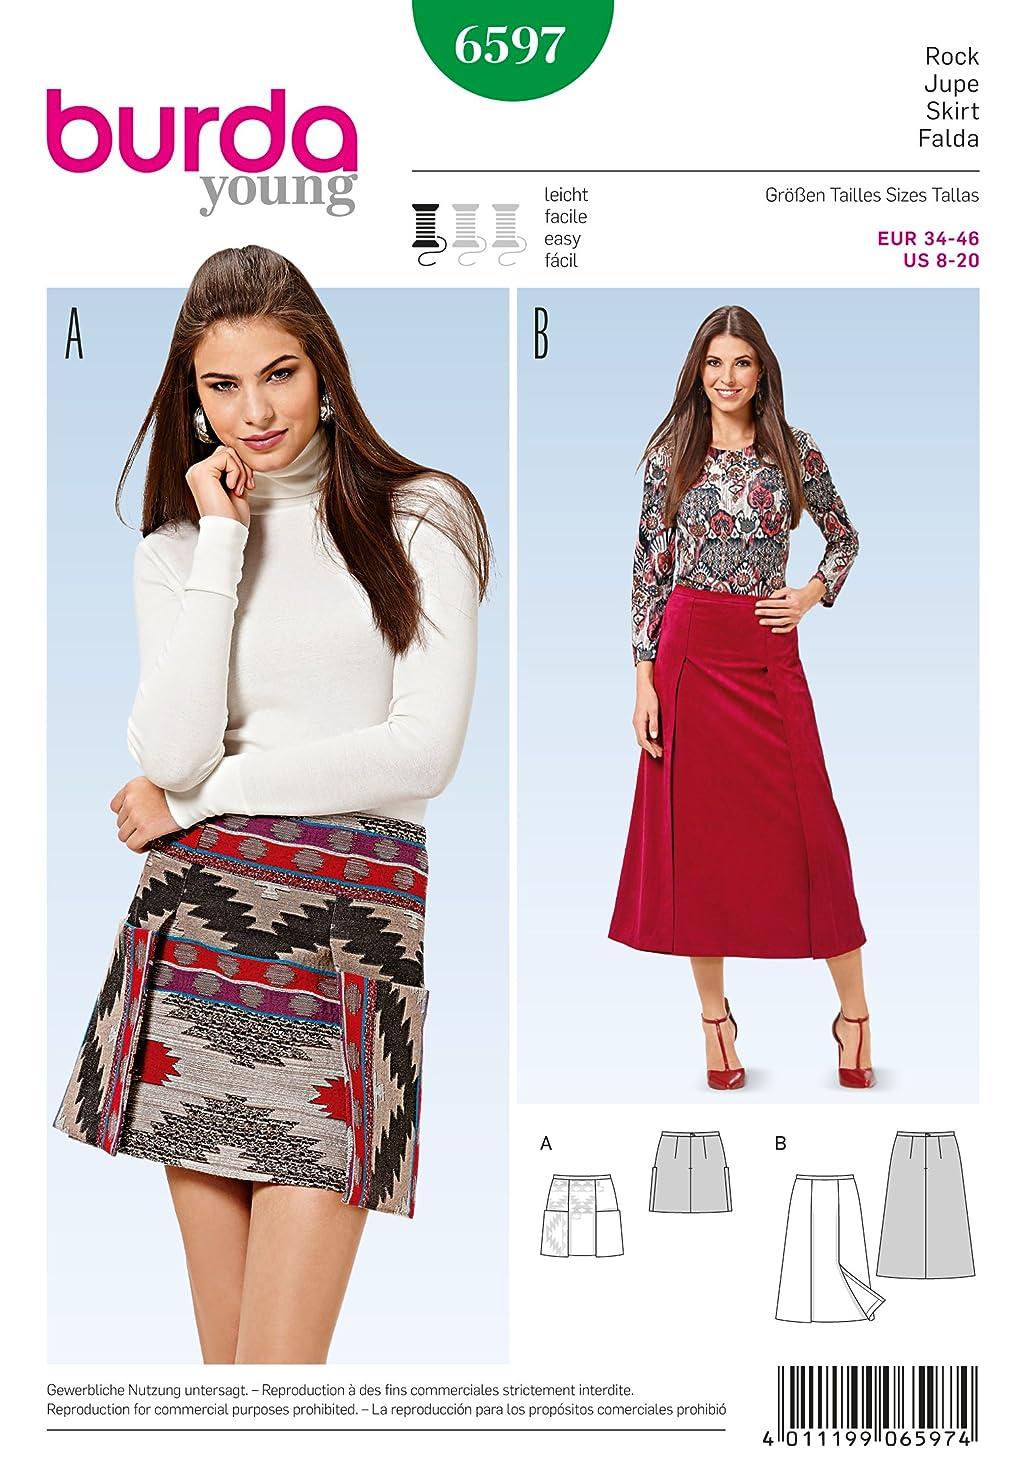 Burda b6597?Skirt Sewing Pattern Paper 19?x 13?x 1?cm White